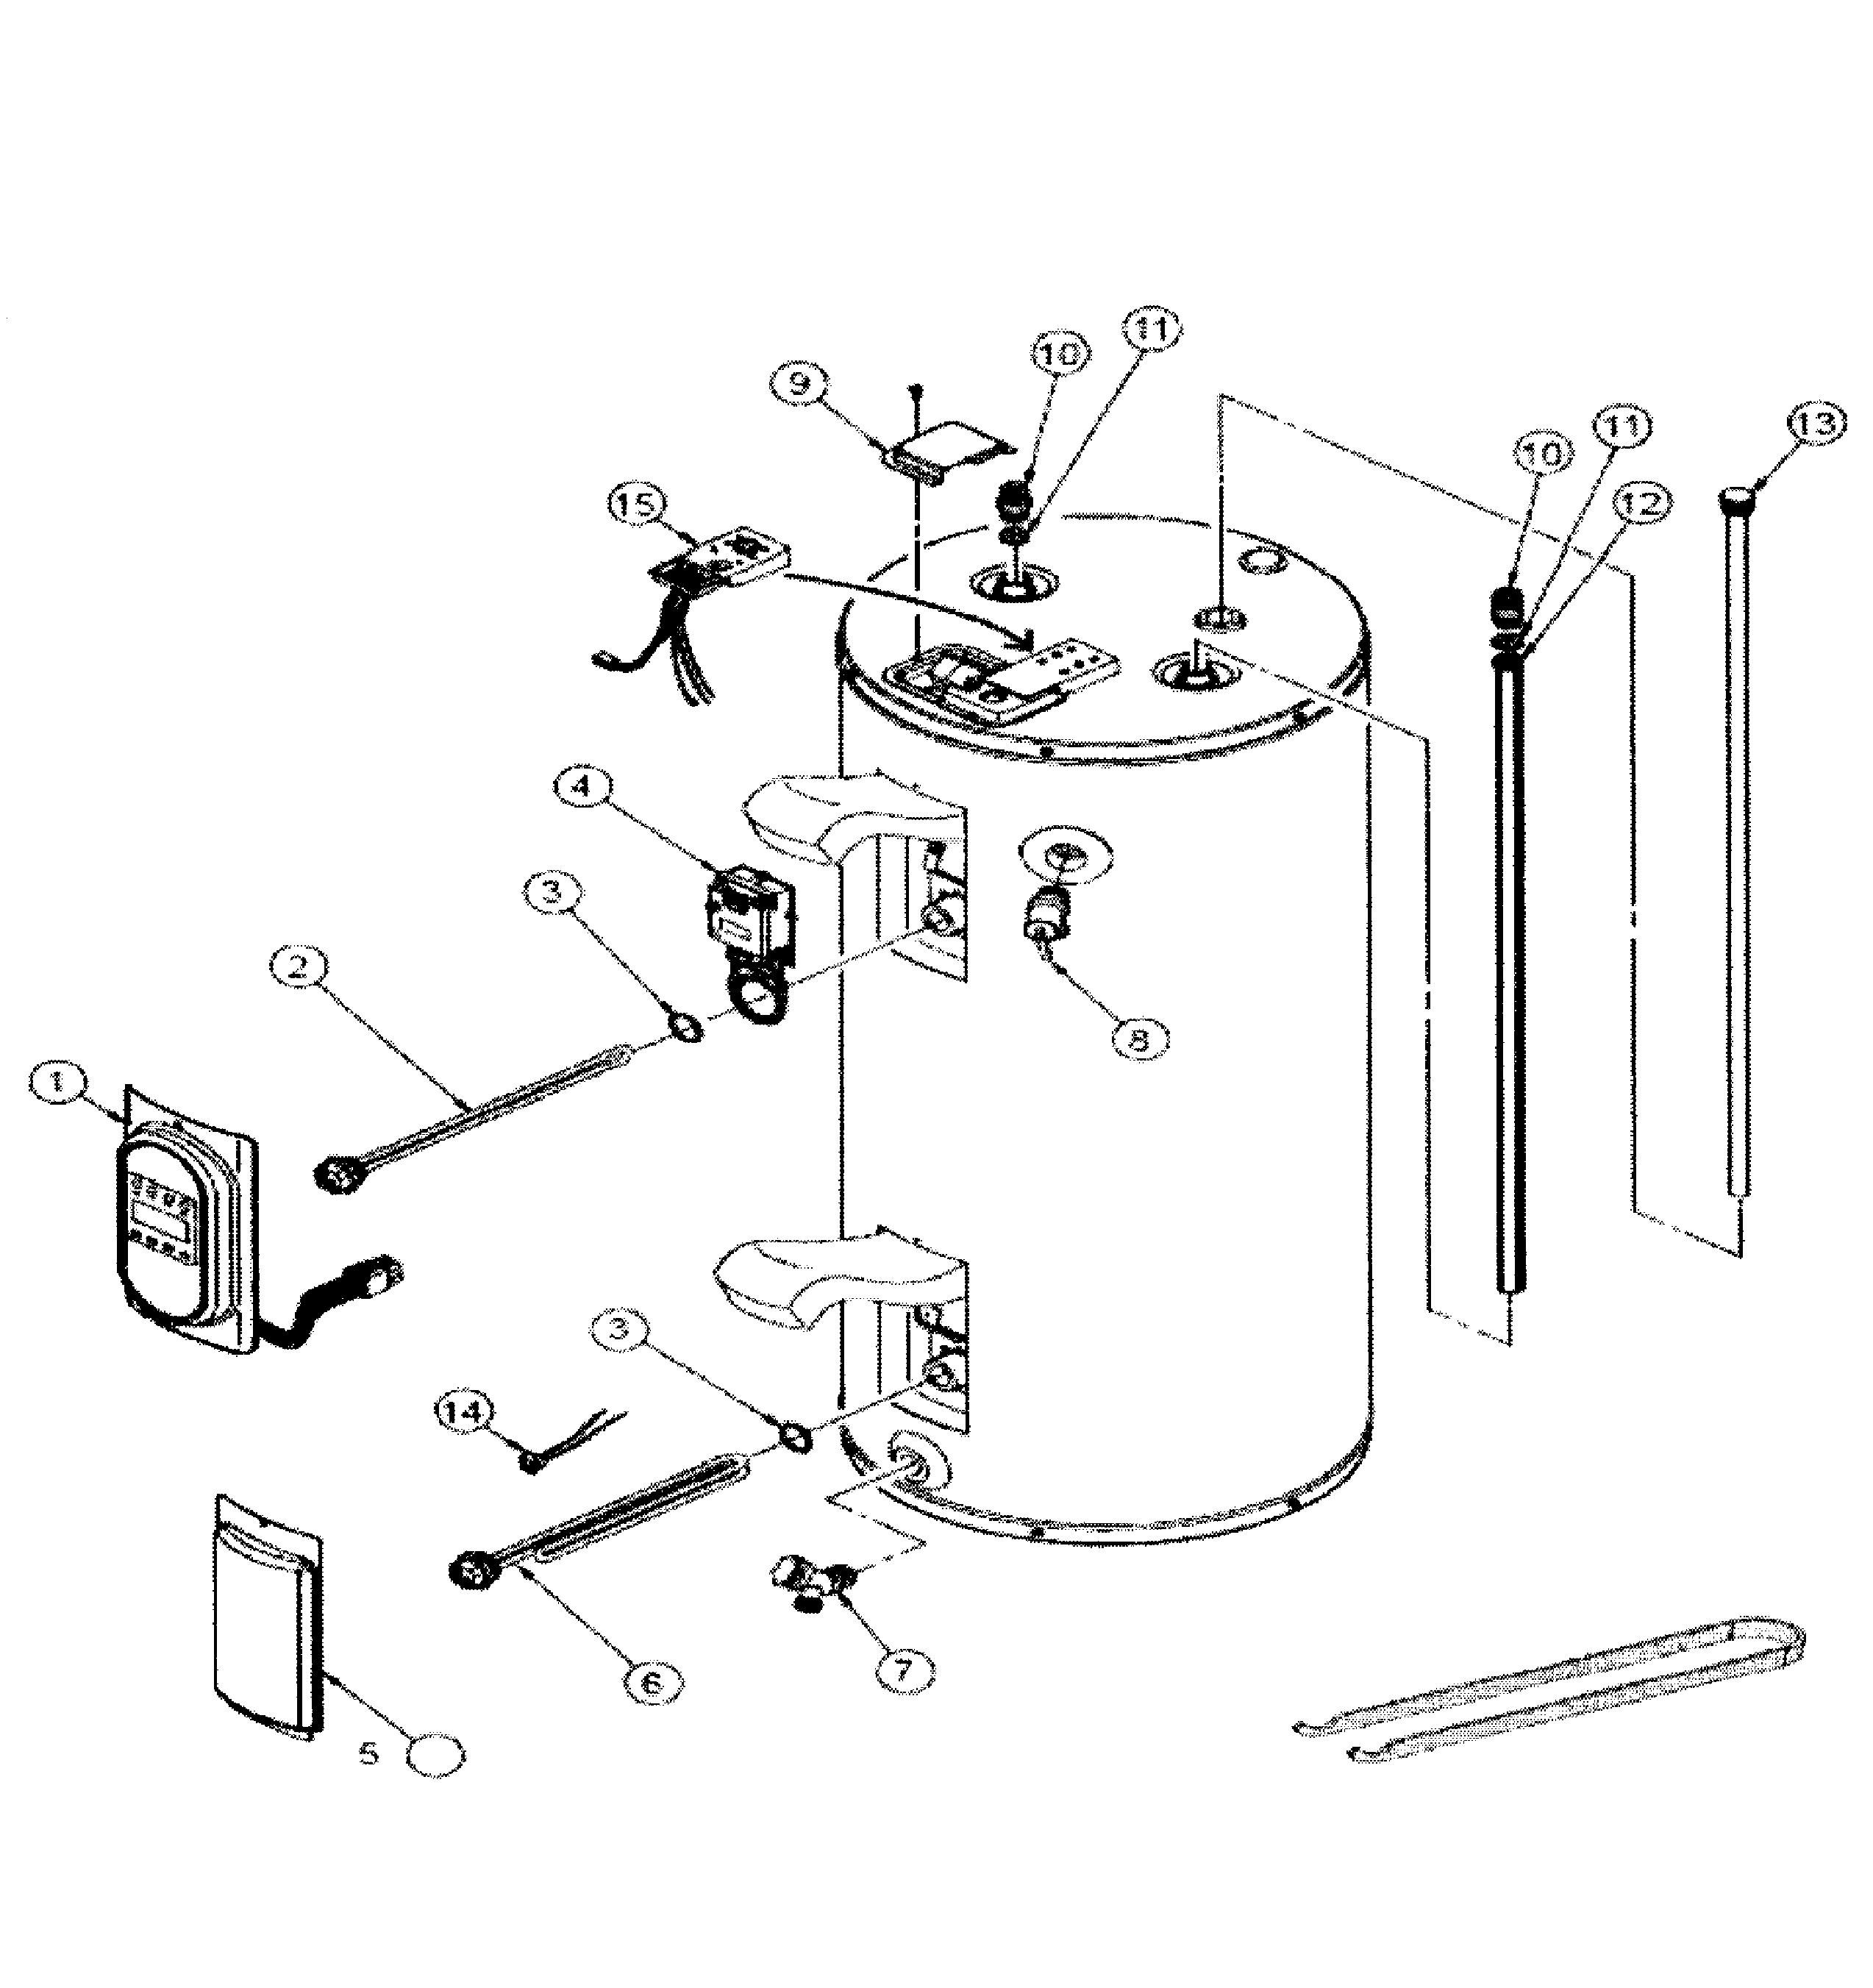 ge water heater model number pg40s9b manual